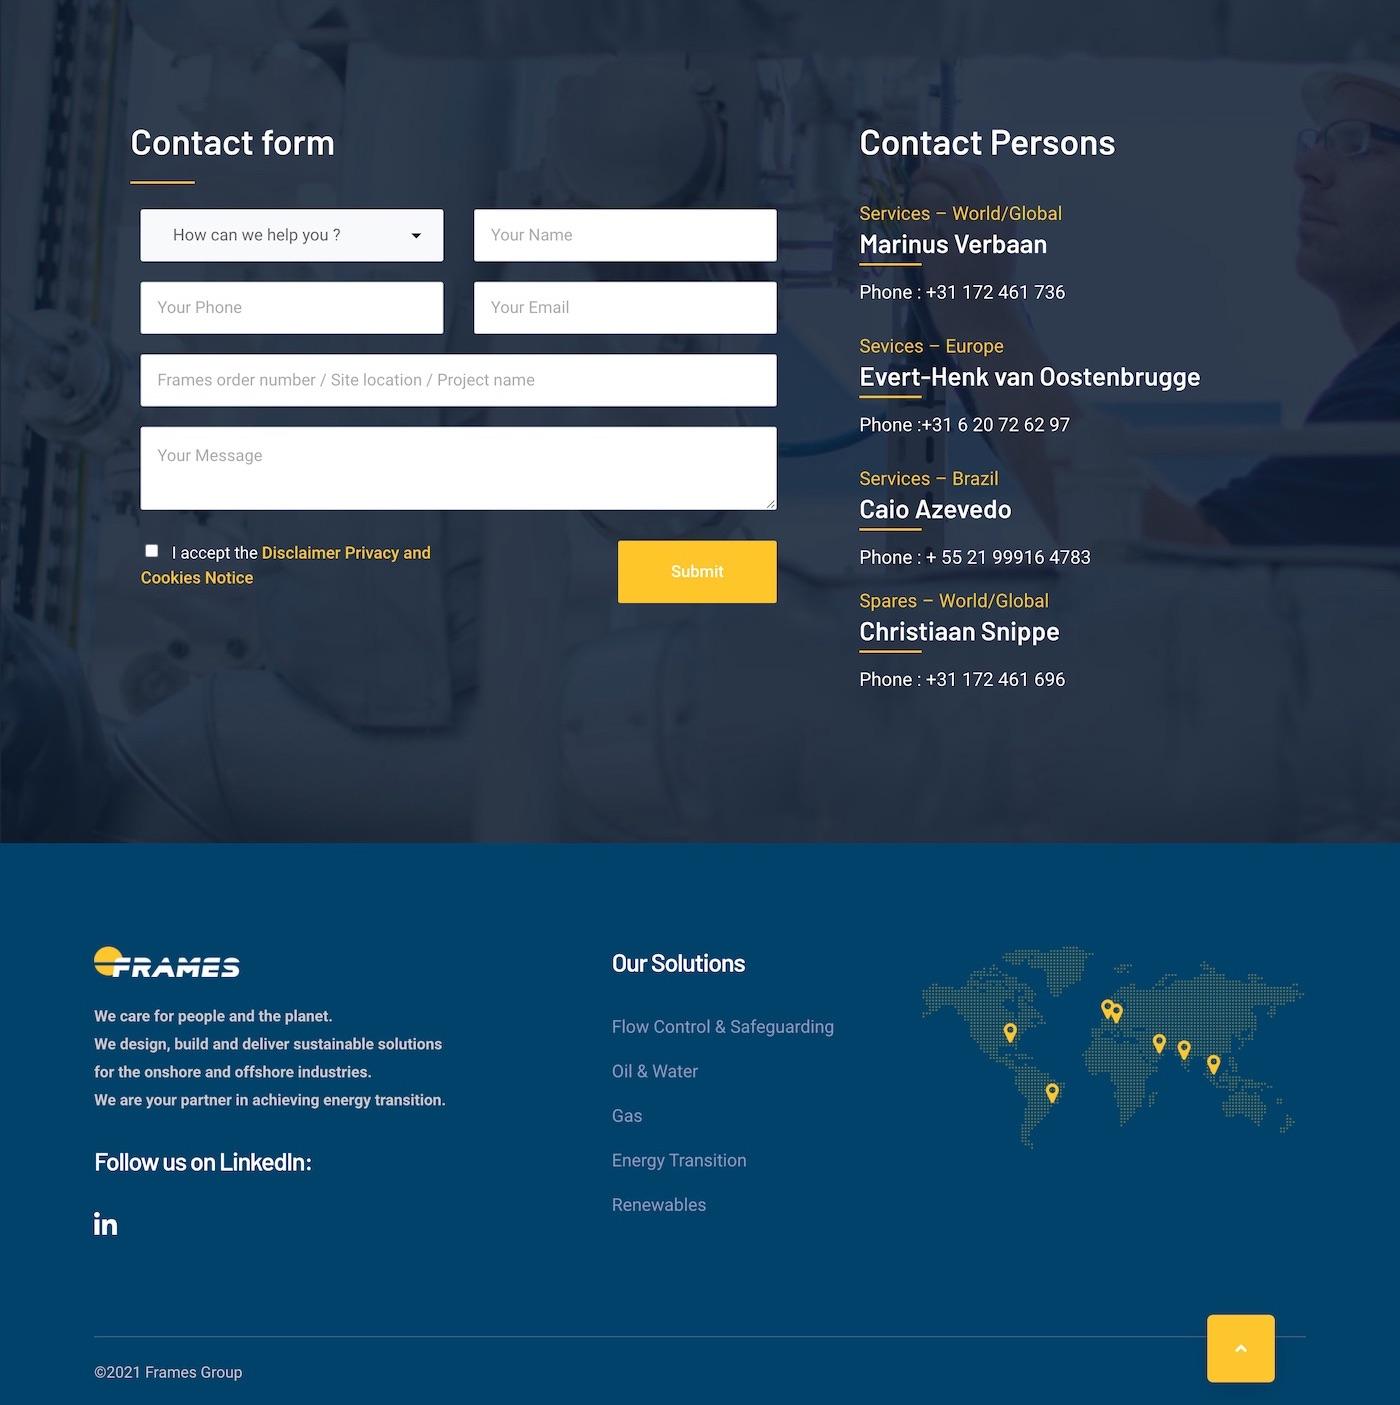 frames-group.com-corporate-wordpress-website-development-work-in-netherland-europe-services-2